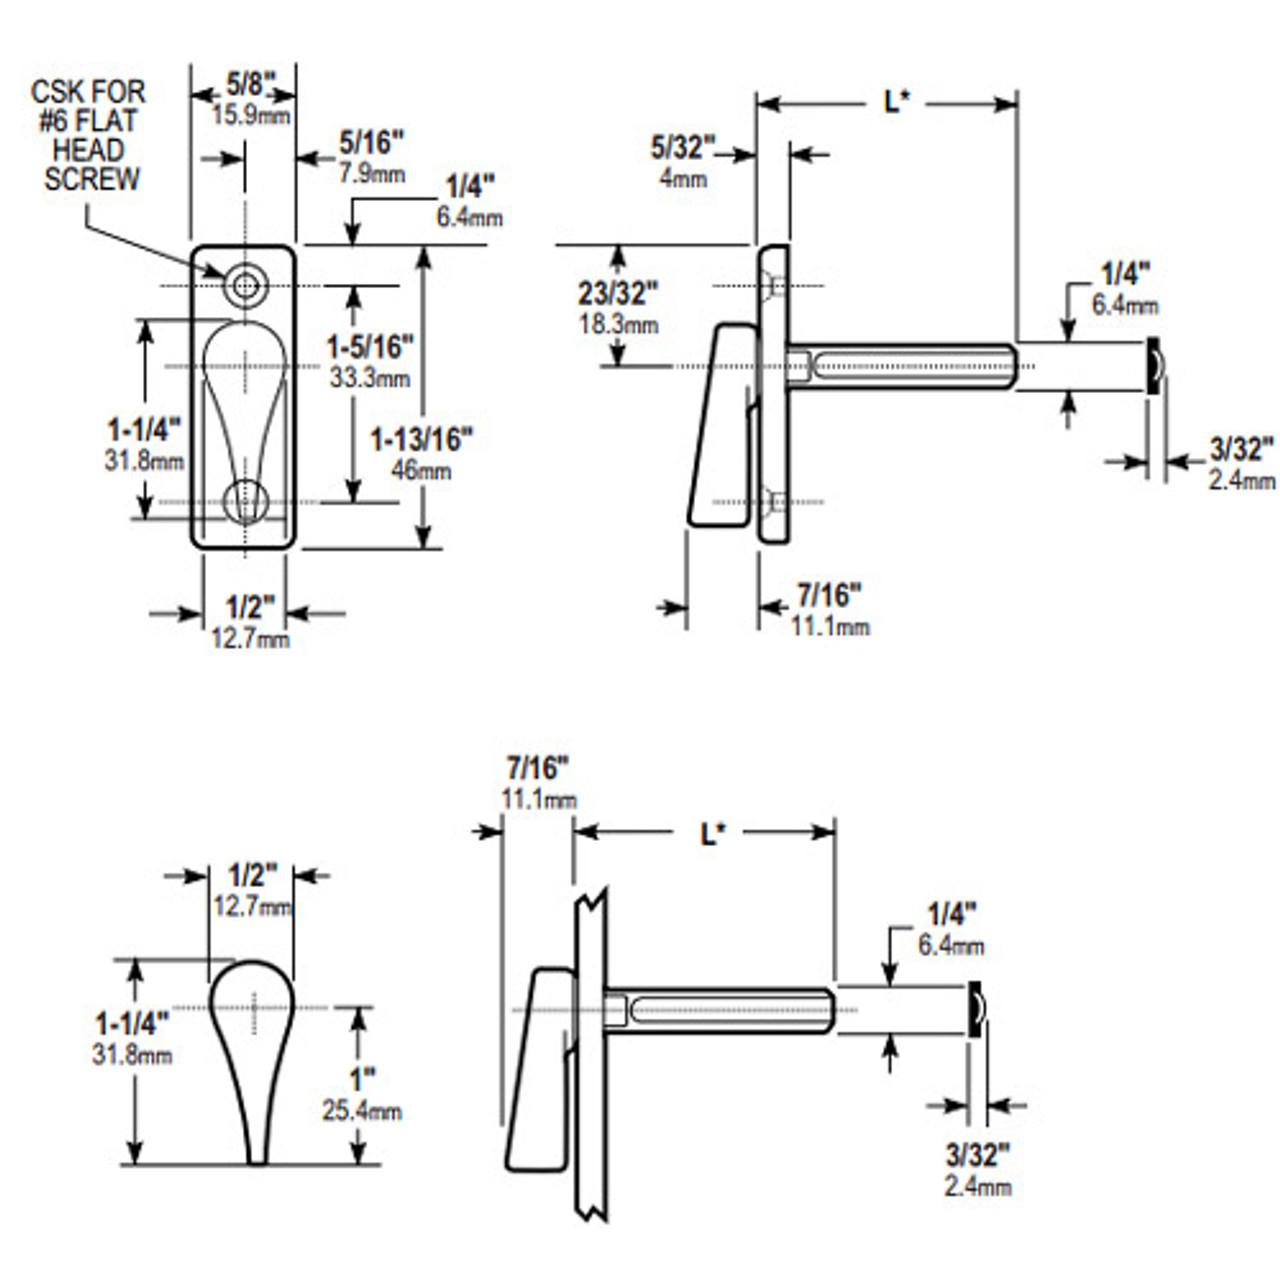 1000-11-21-121 Adams Rite 1000 Series Turns Dimensional View